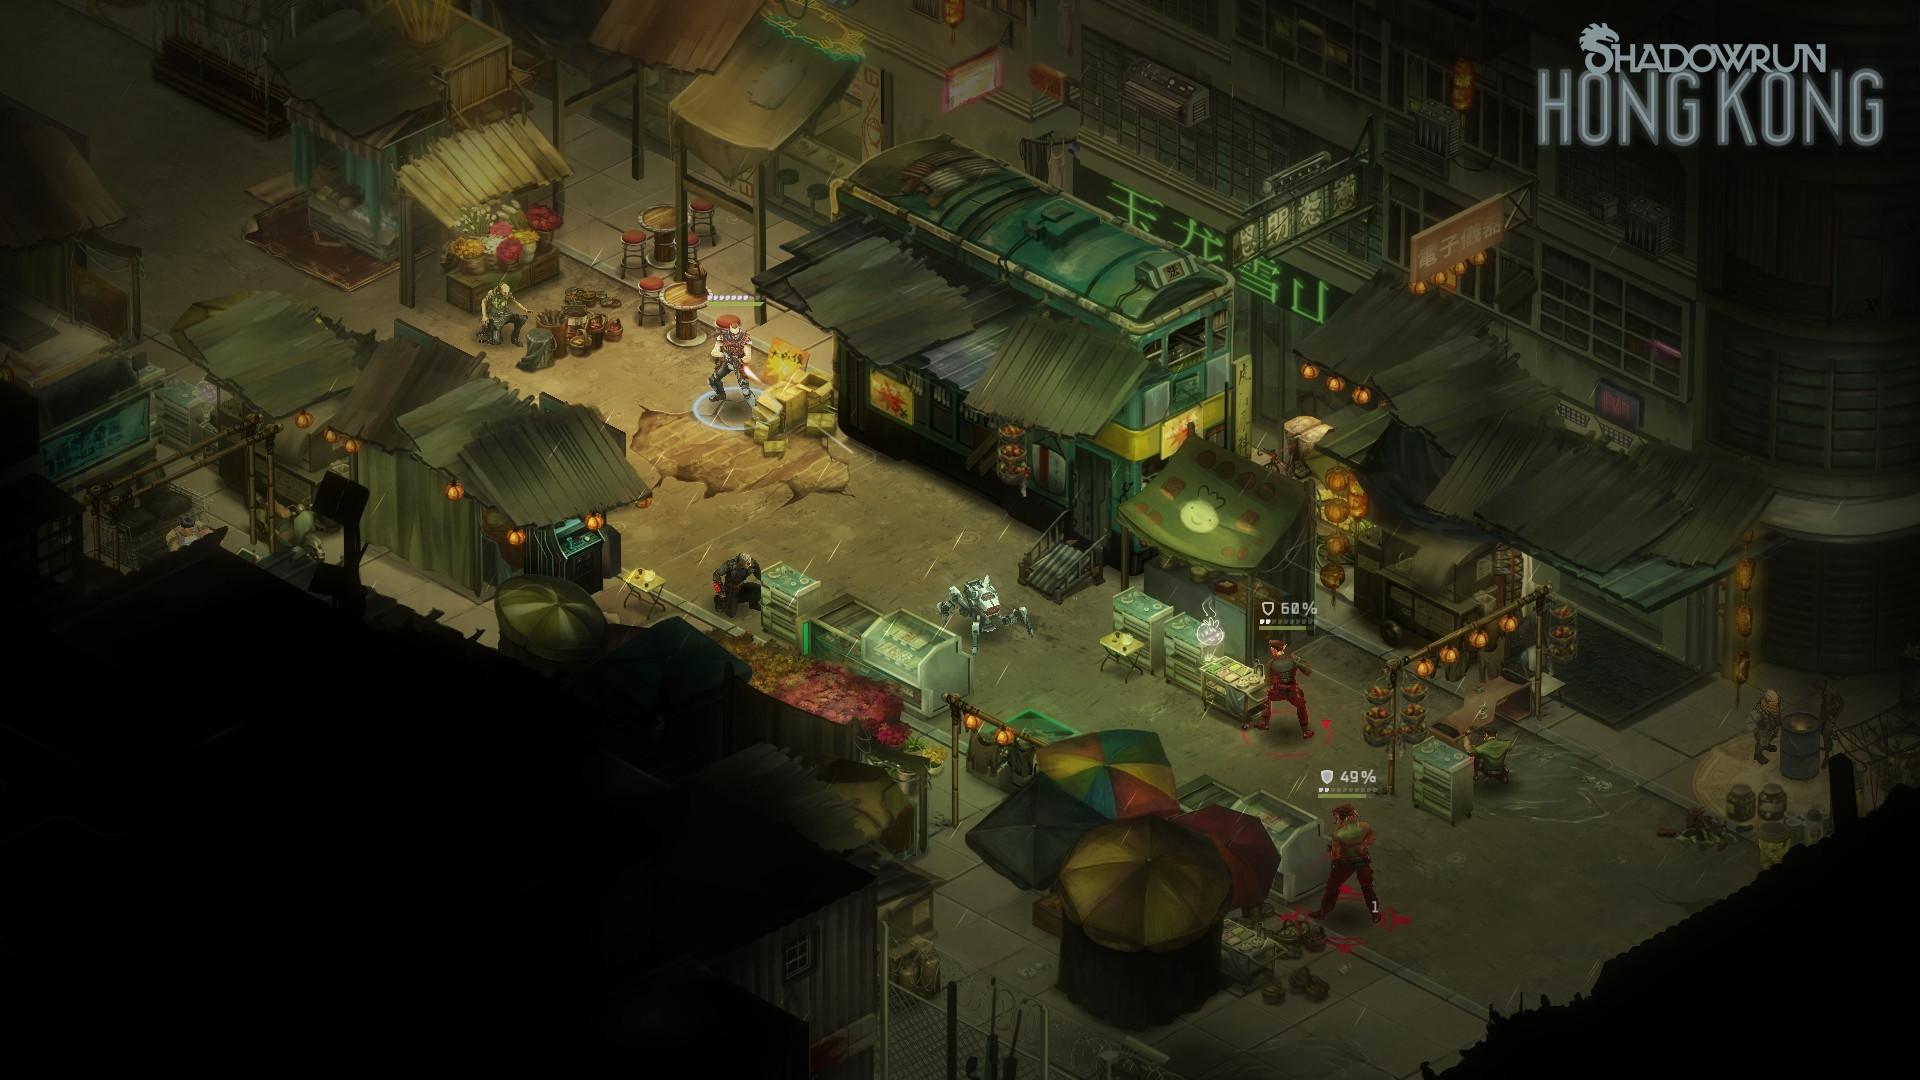 Shadowrun: Hong Kong - Extended Edition Steam Key 2019